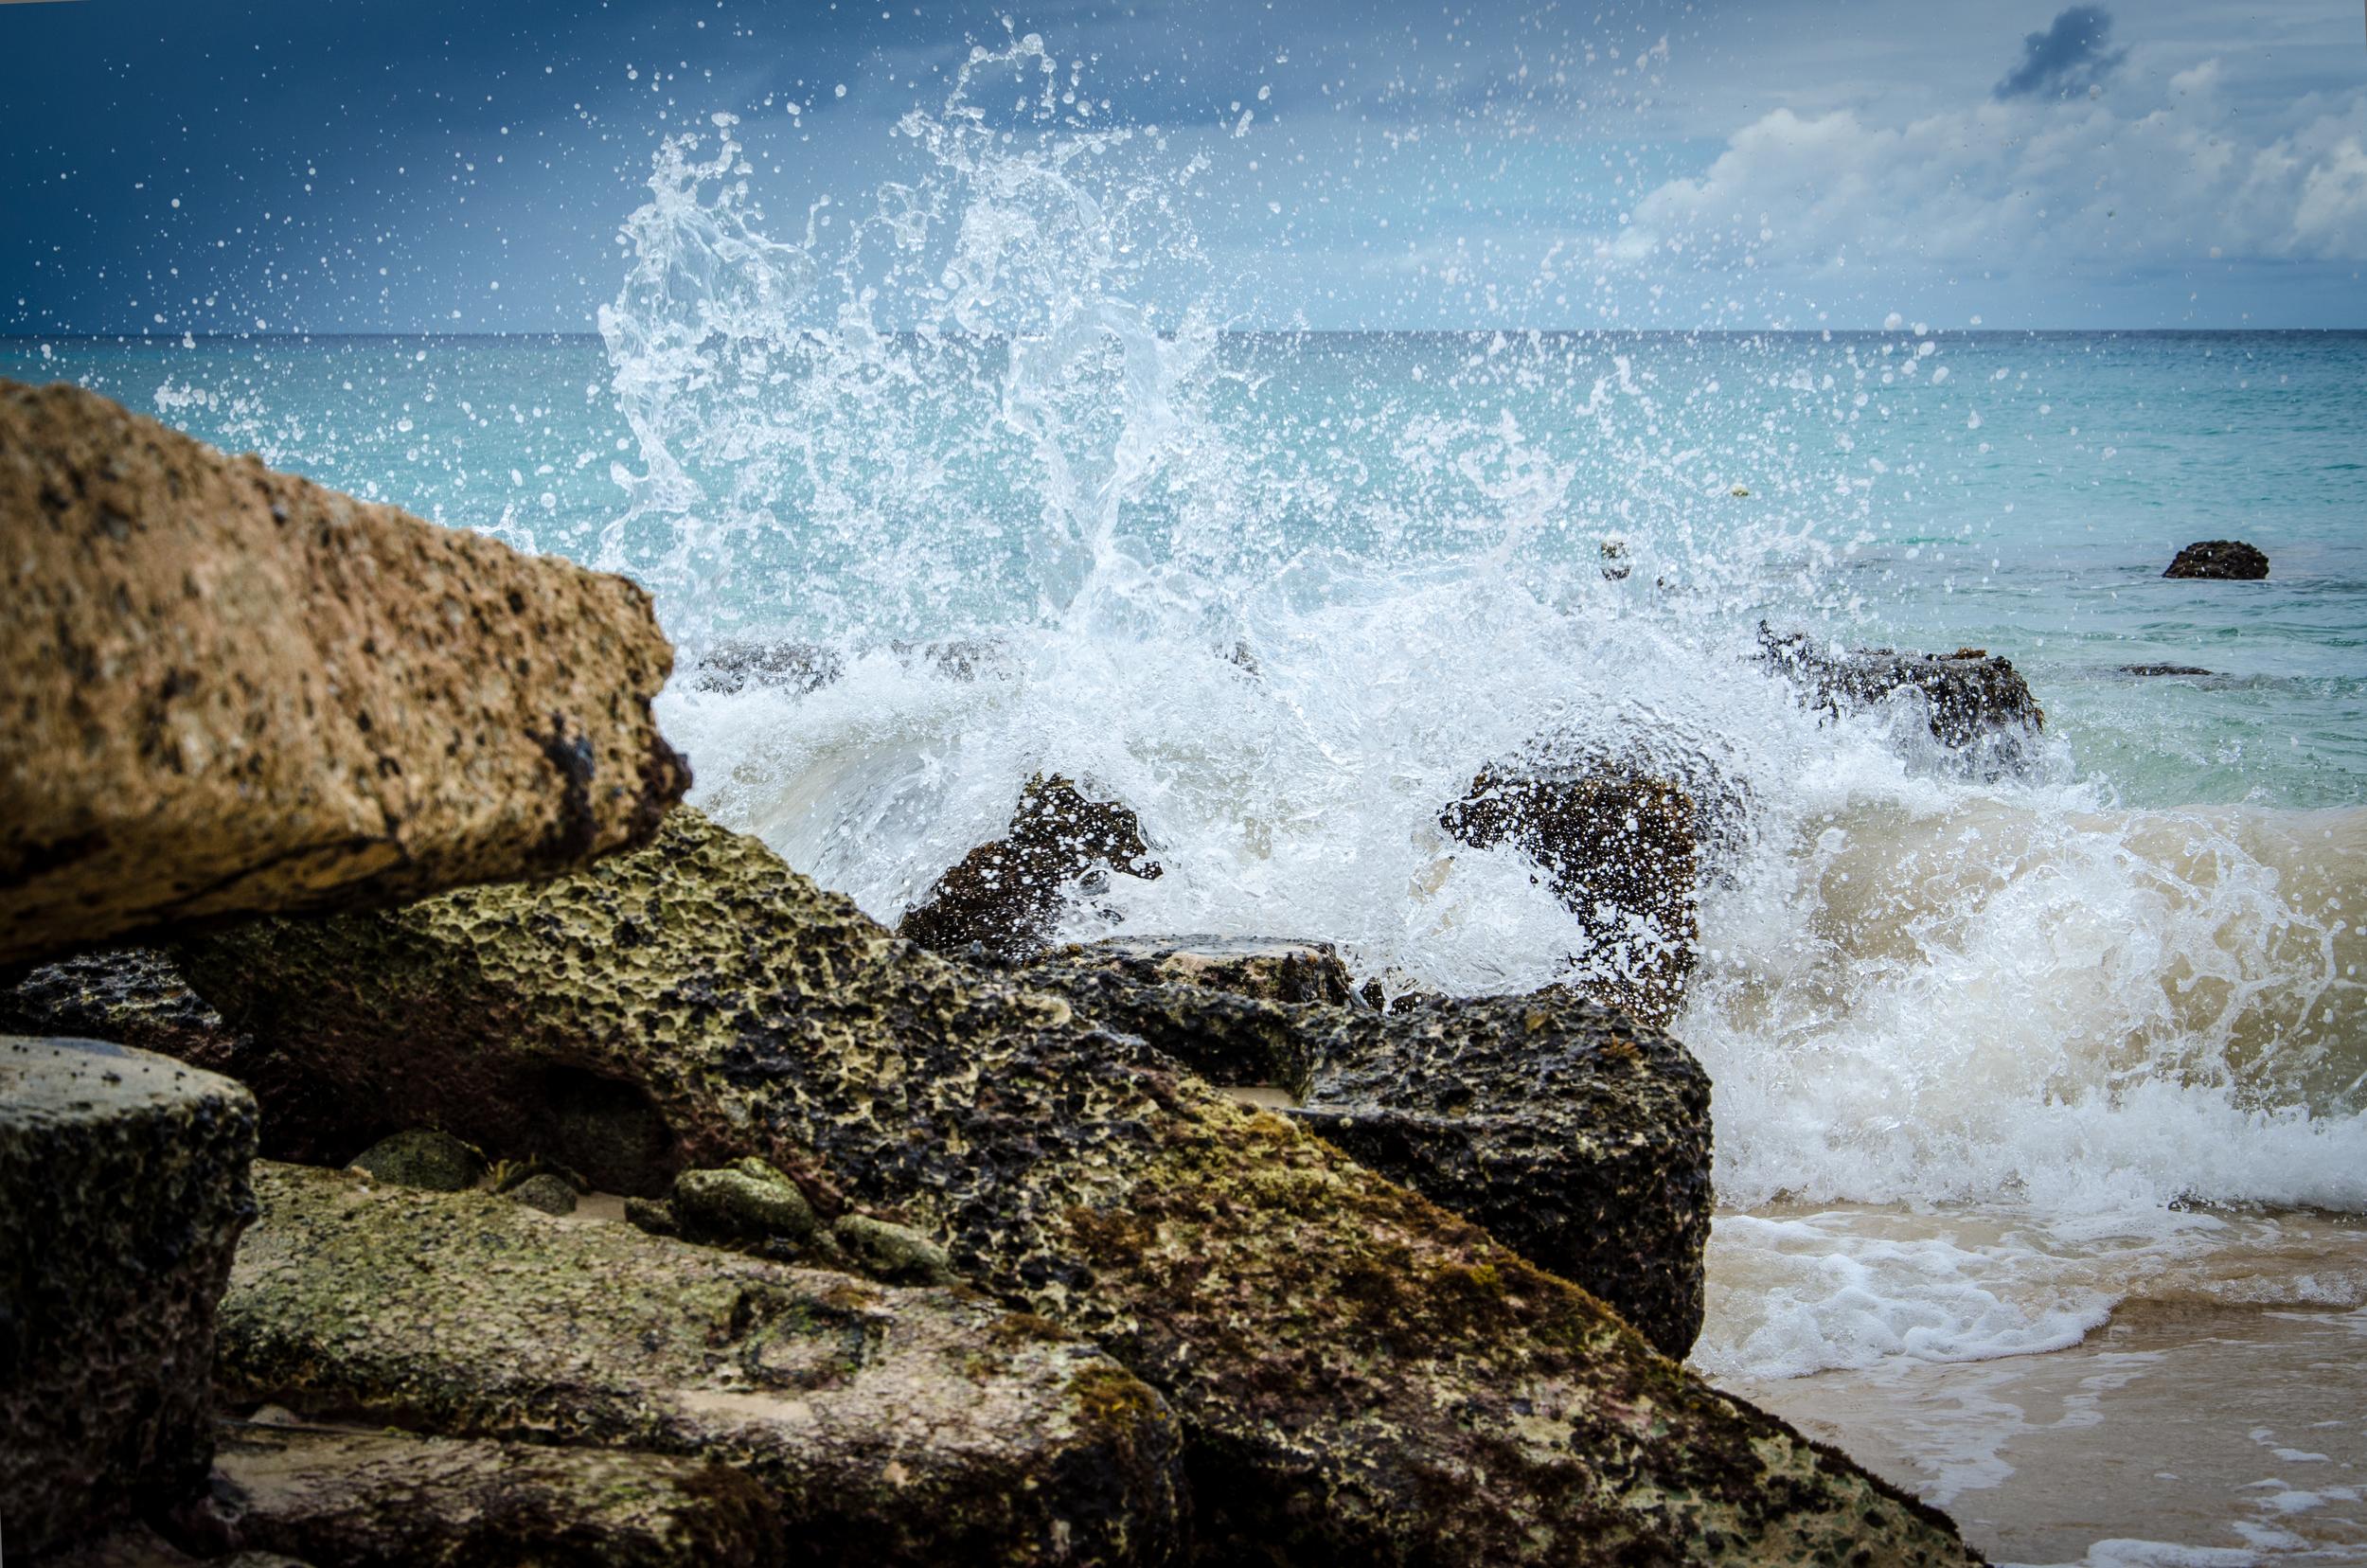 Waves on the rocks at the Fairmont Royal Pavilion Resort.